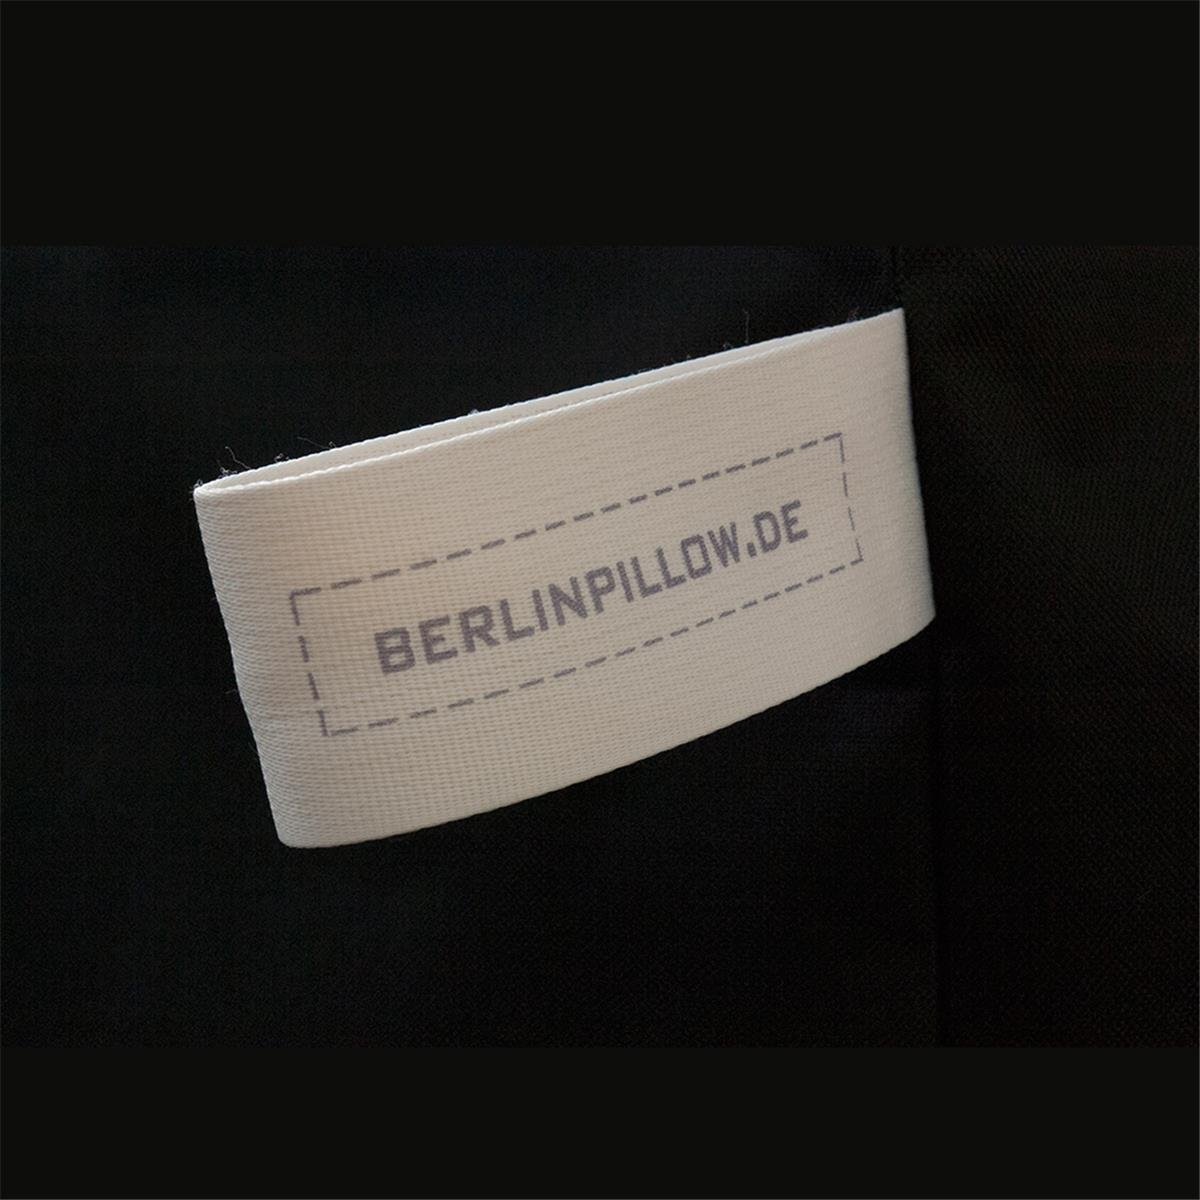 Berlinpillow  4260406163778 Original Bean Bean Bean Bag In und Outdoor PalettenRückenkissen Pallets Bag, 160 x 30 x 10 cm, anthrazit af954d